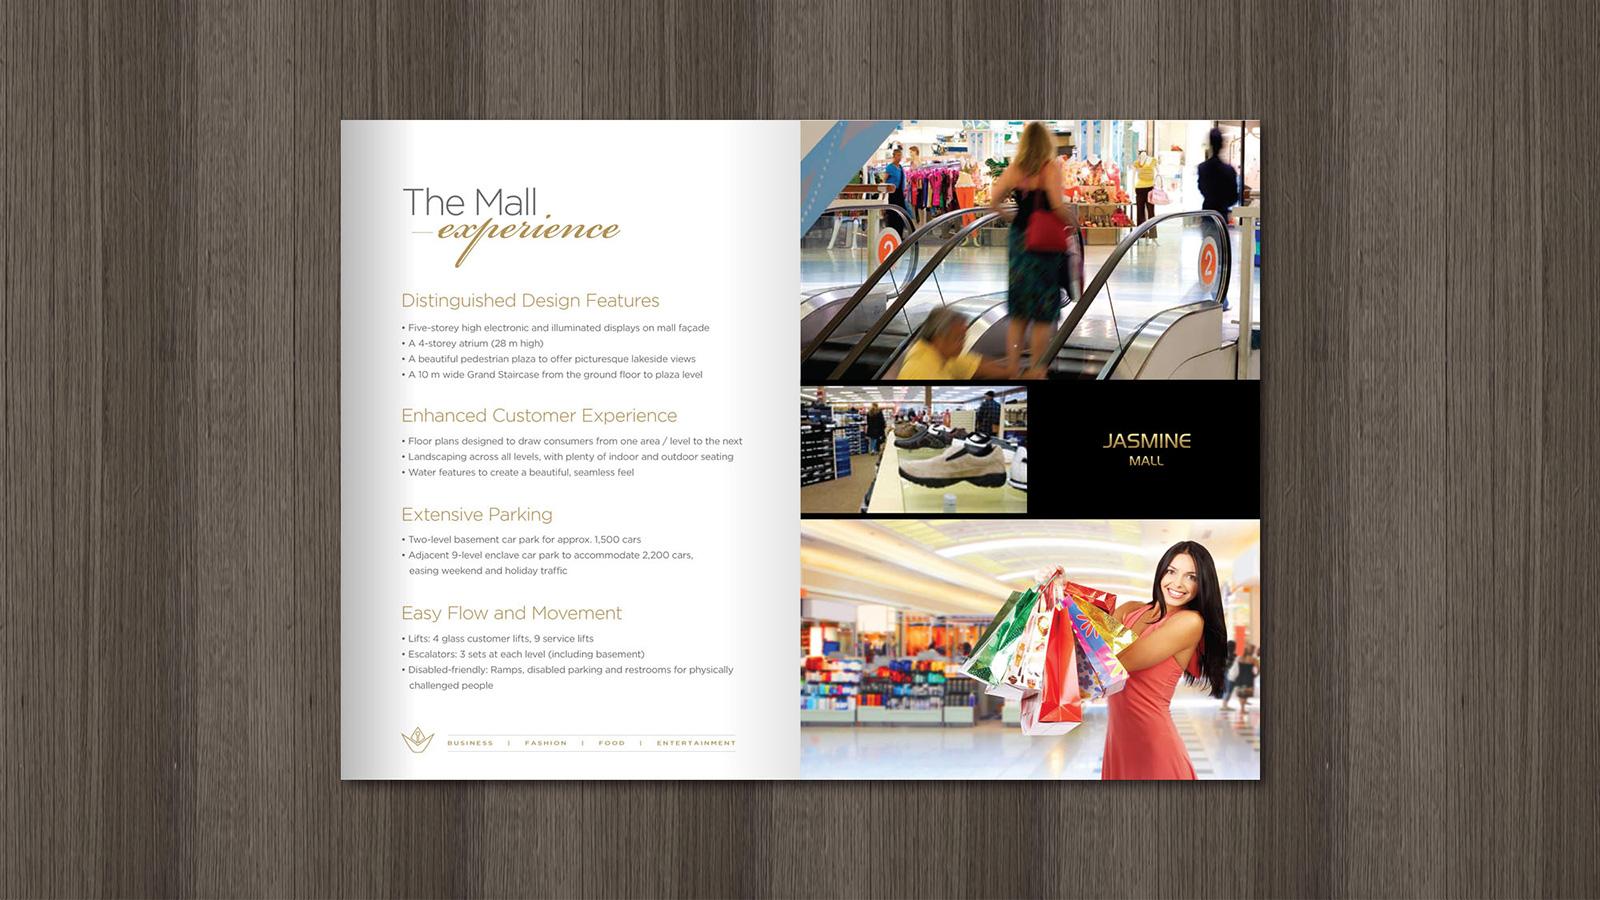 graphic-brand-design-web-designer-hiline-lahore-pakistan-jasmine-mall-013